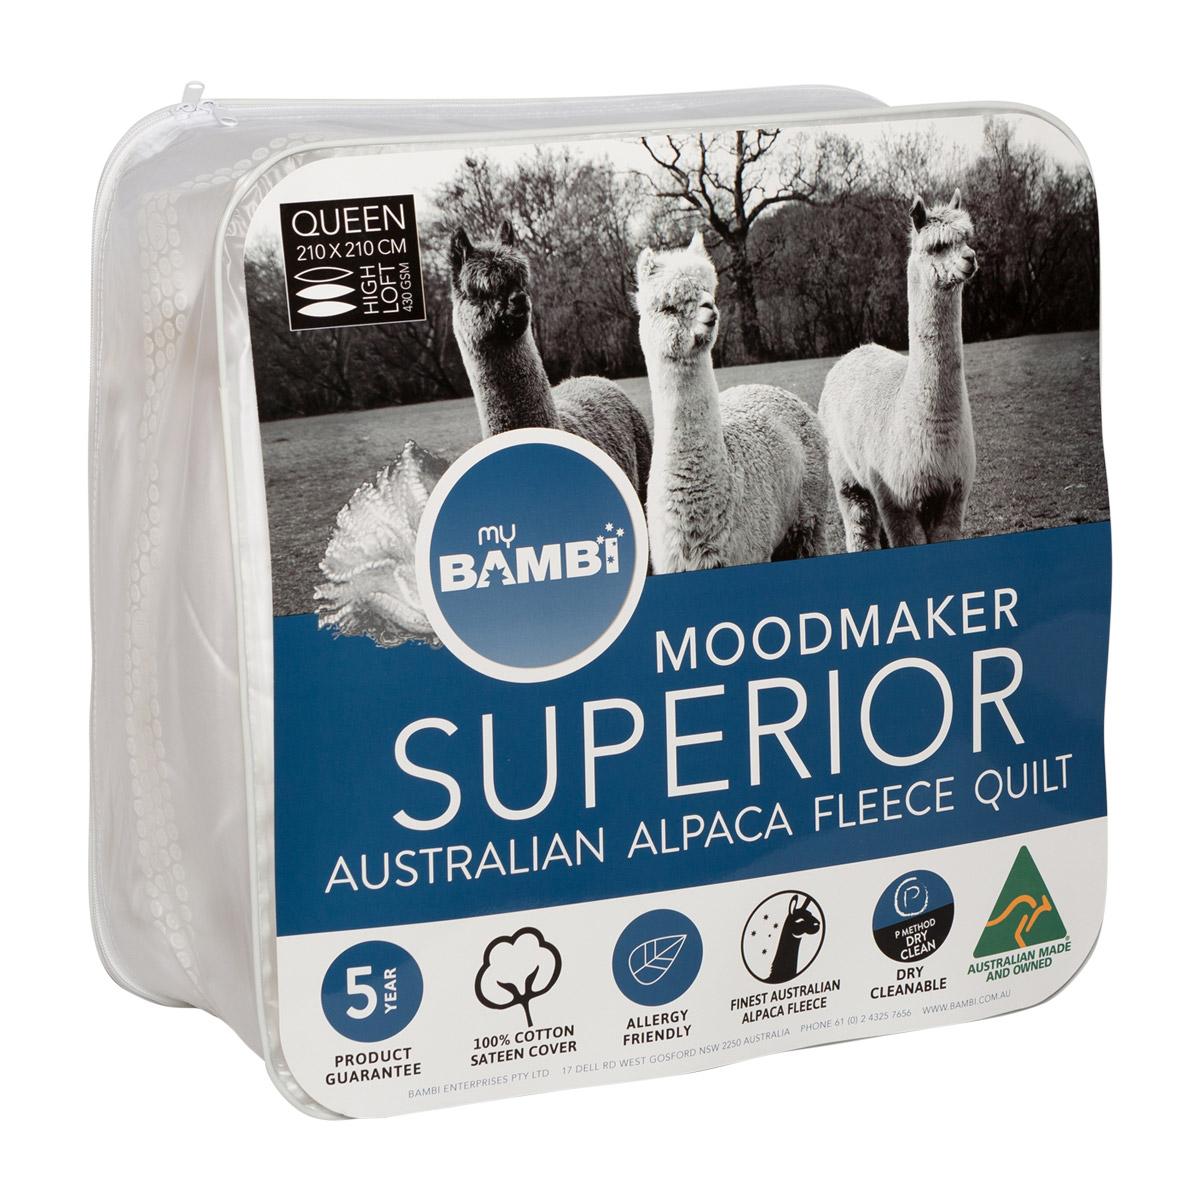 Bambi Luxura Alpaca Fleece Quilt 300 and 430gsm